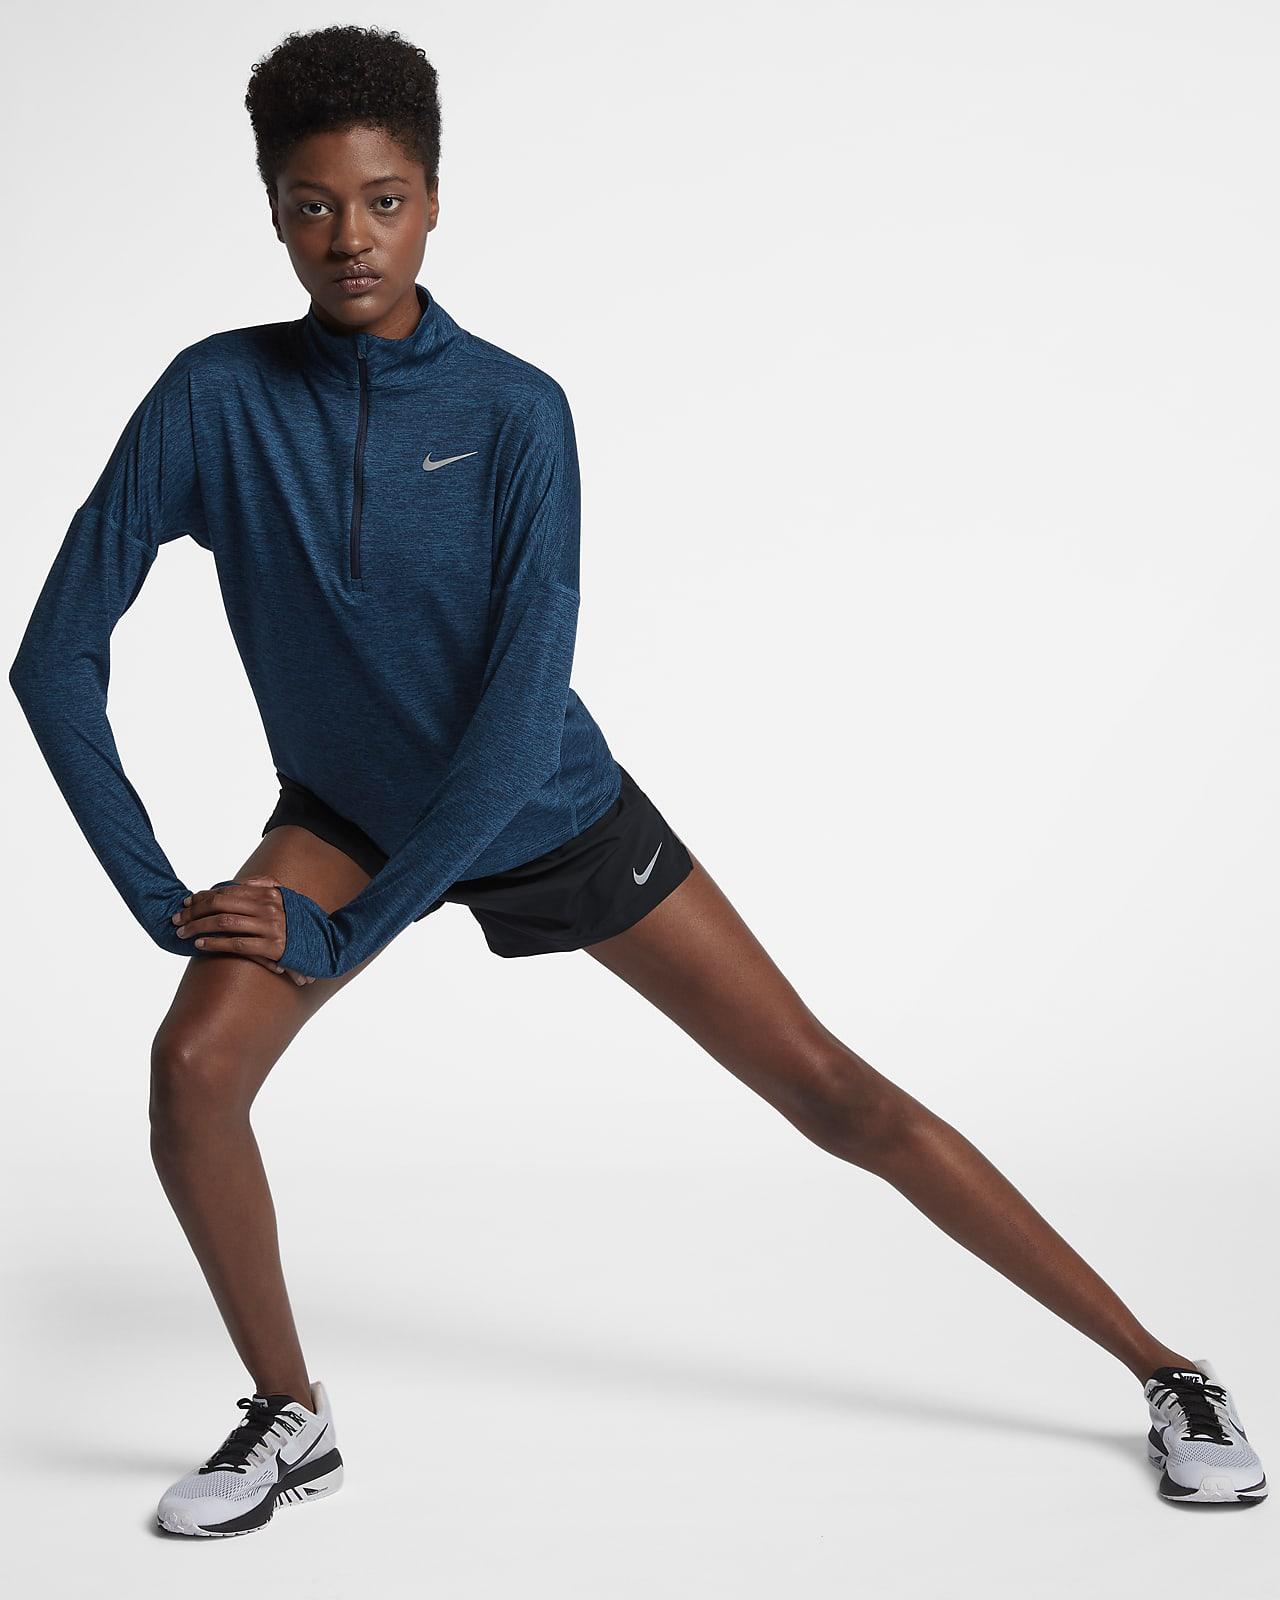 Track Running Shorts. Nike